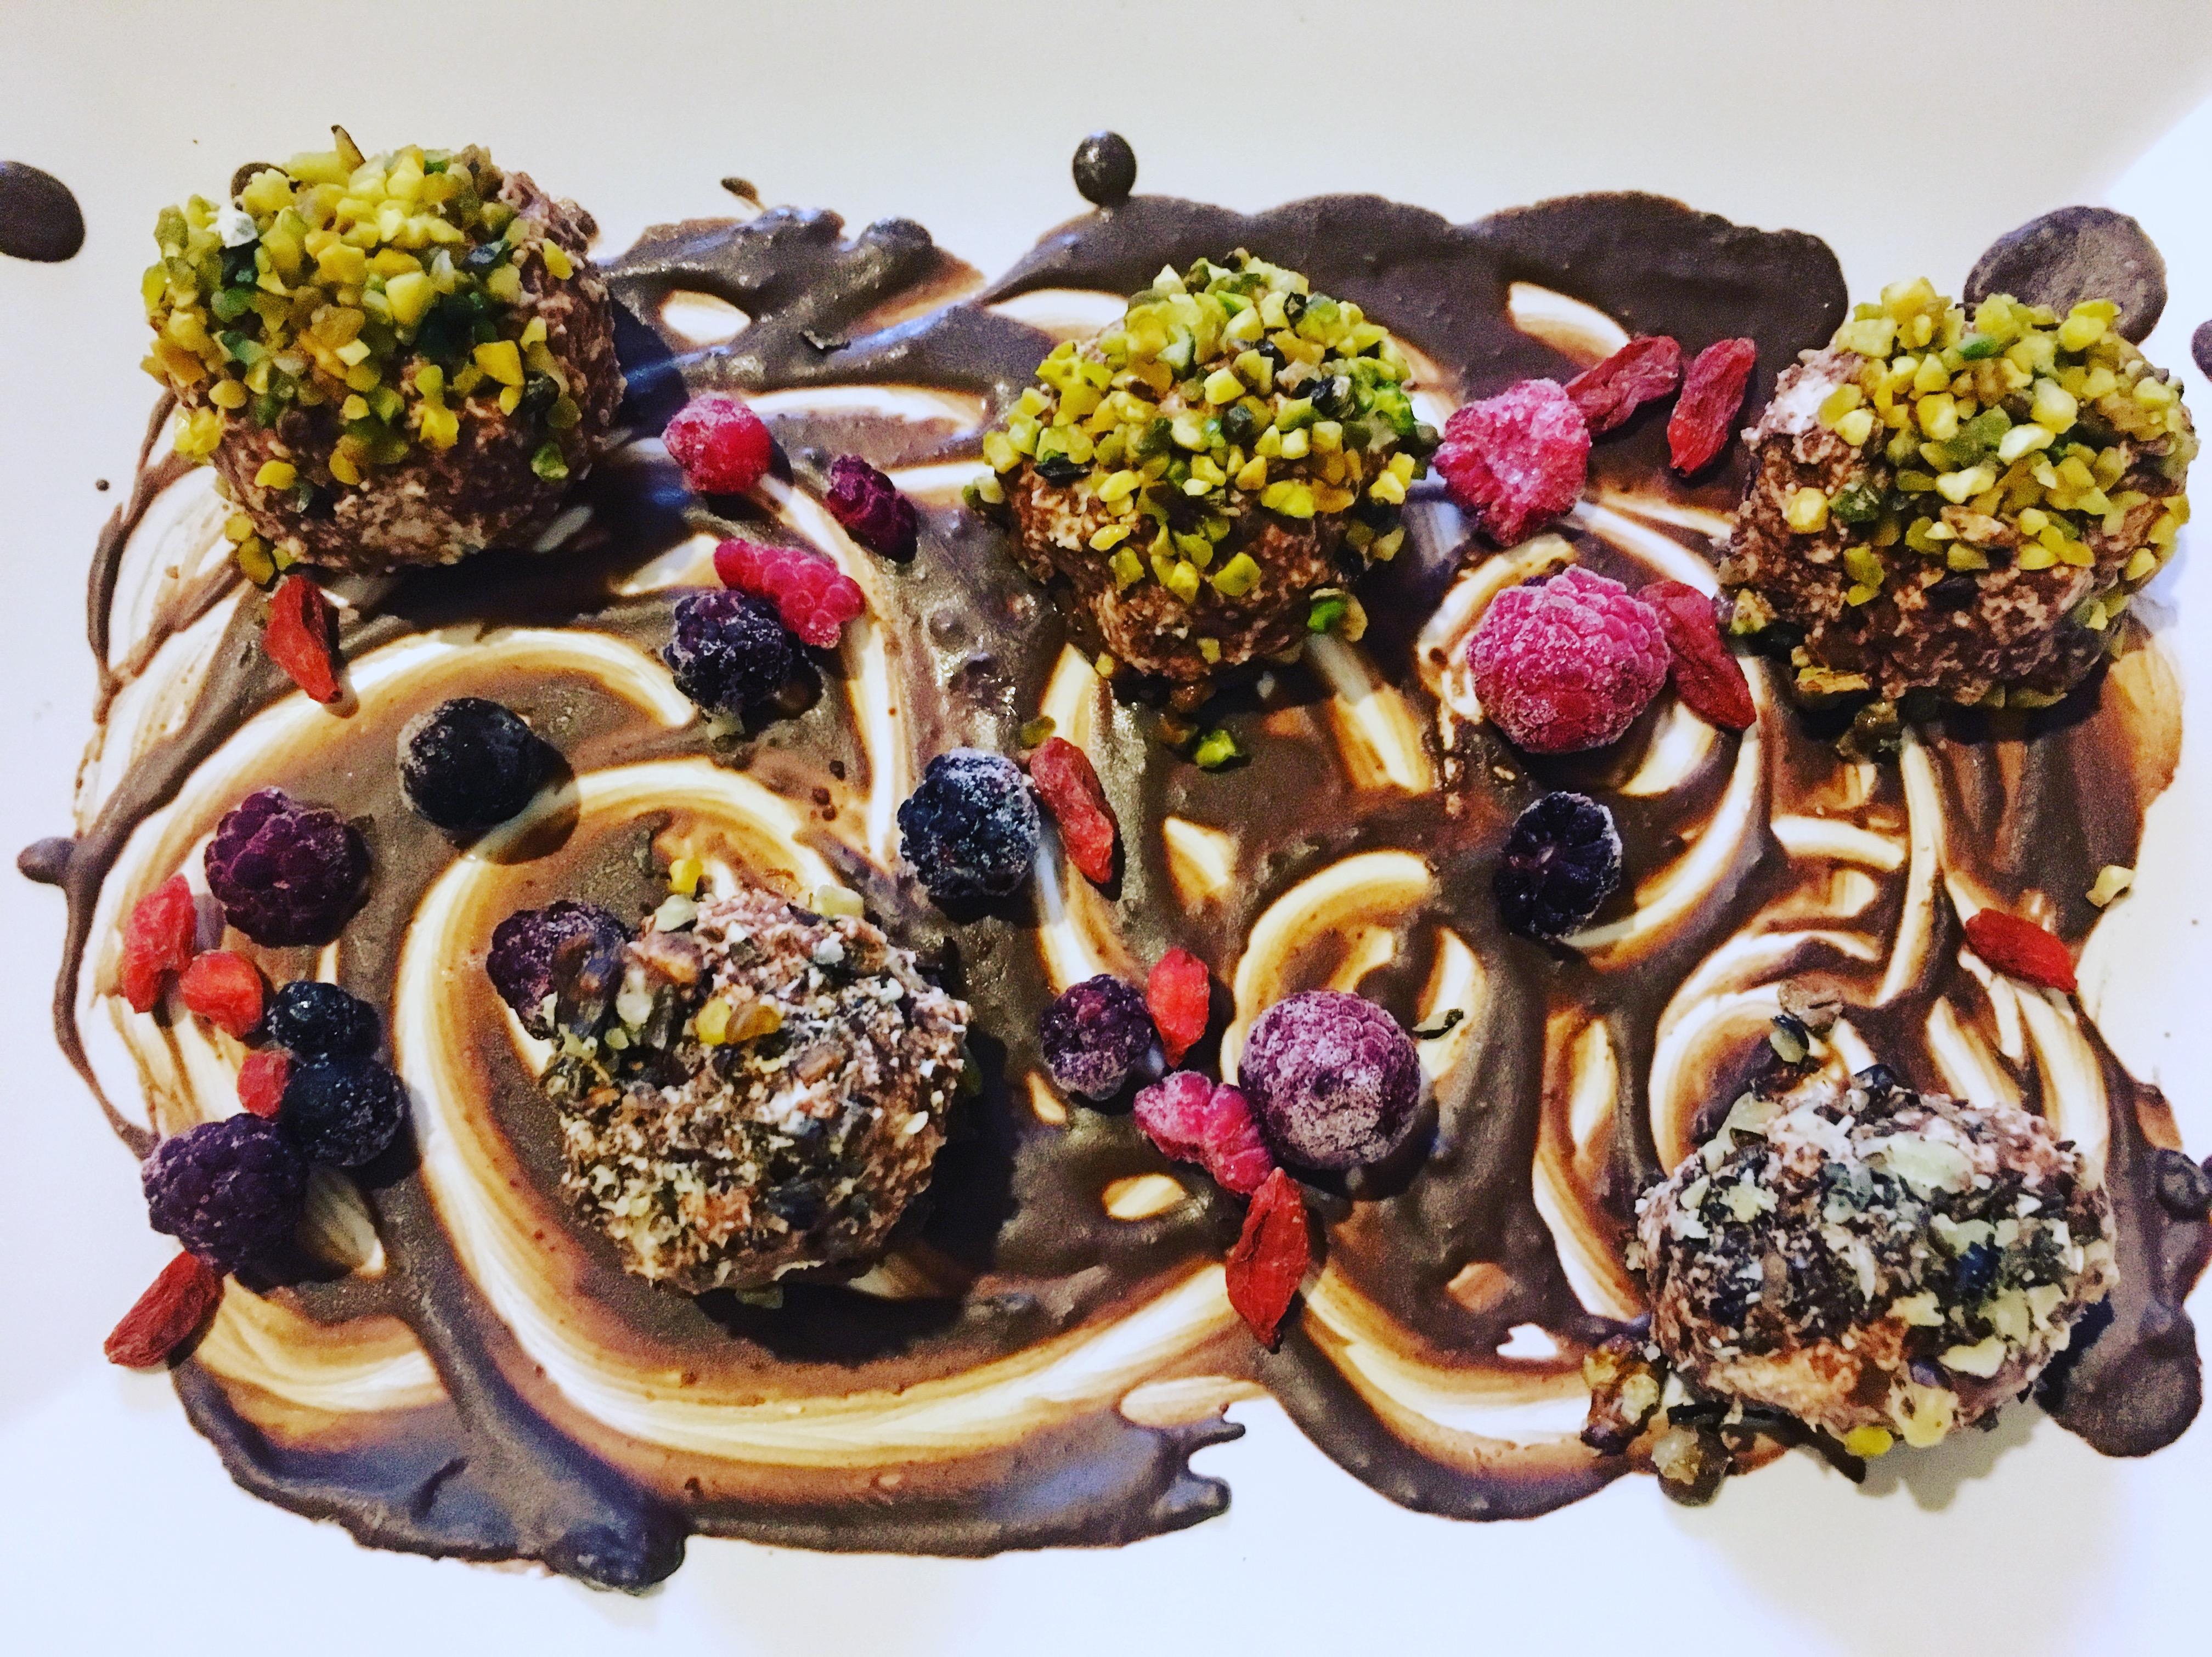 praline di yogurt e cioccolato